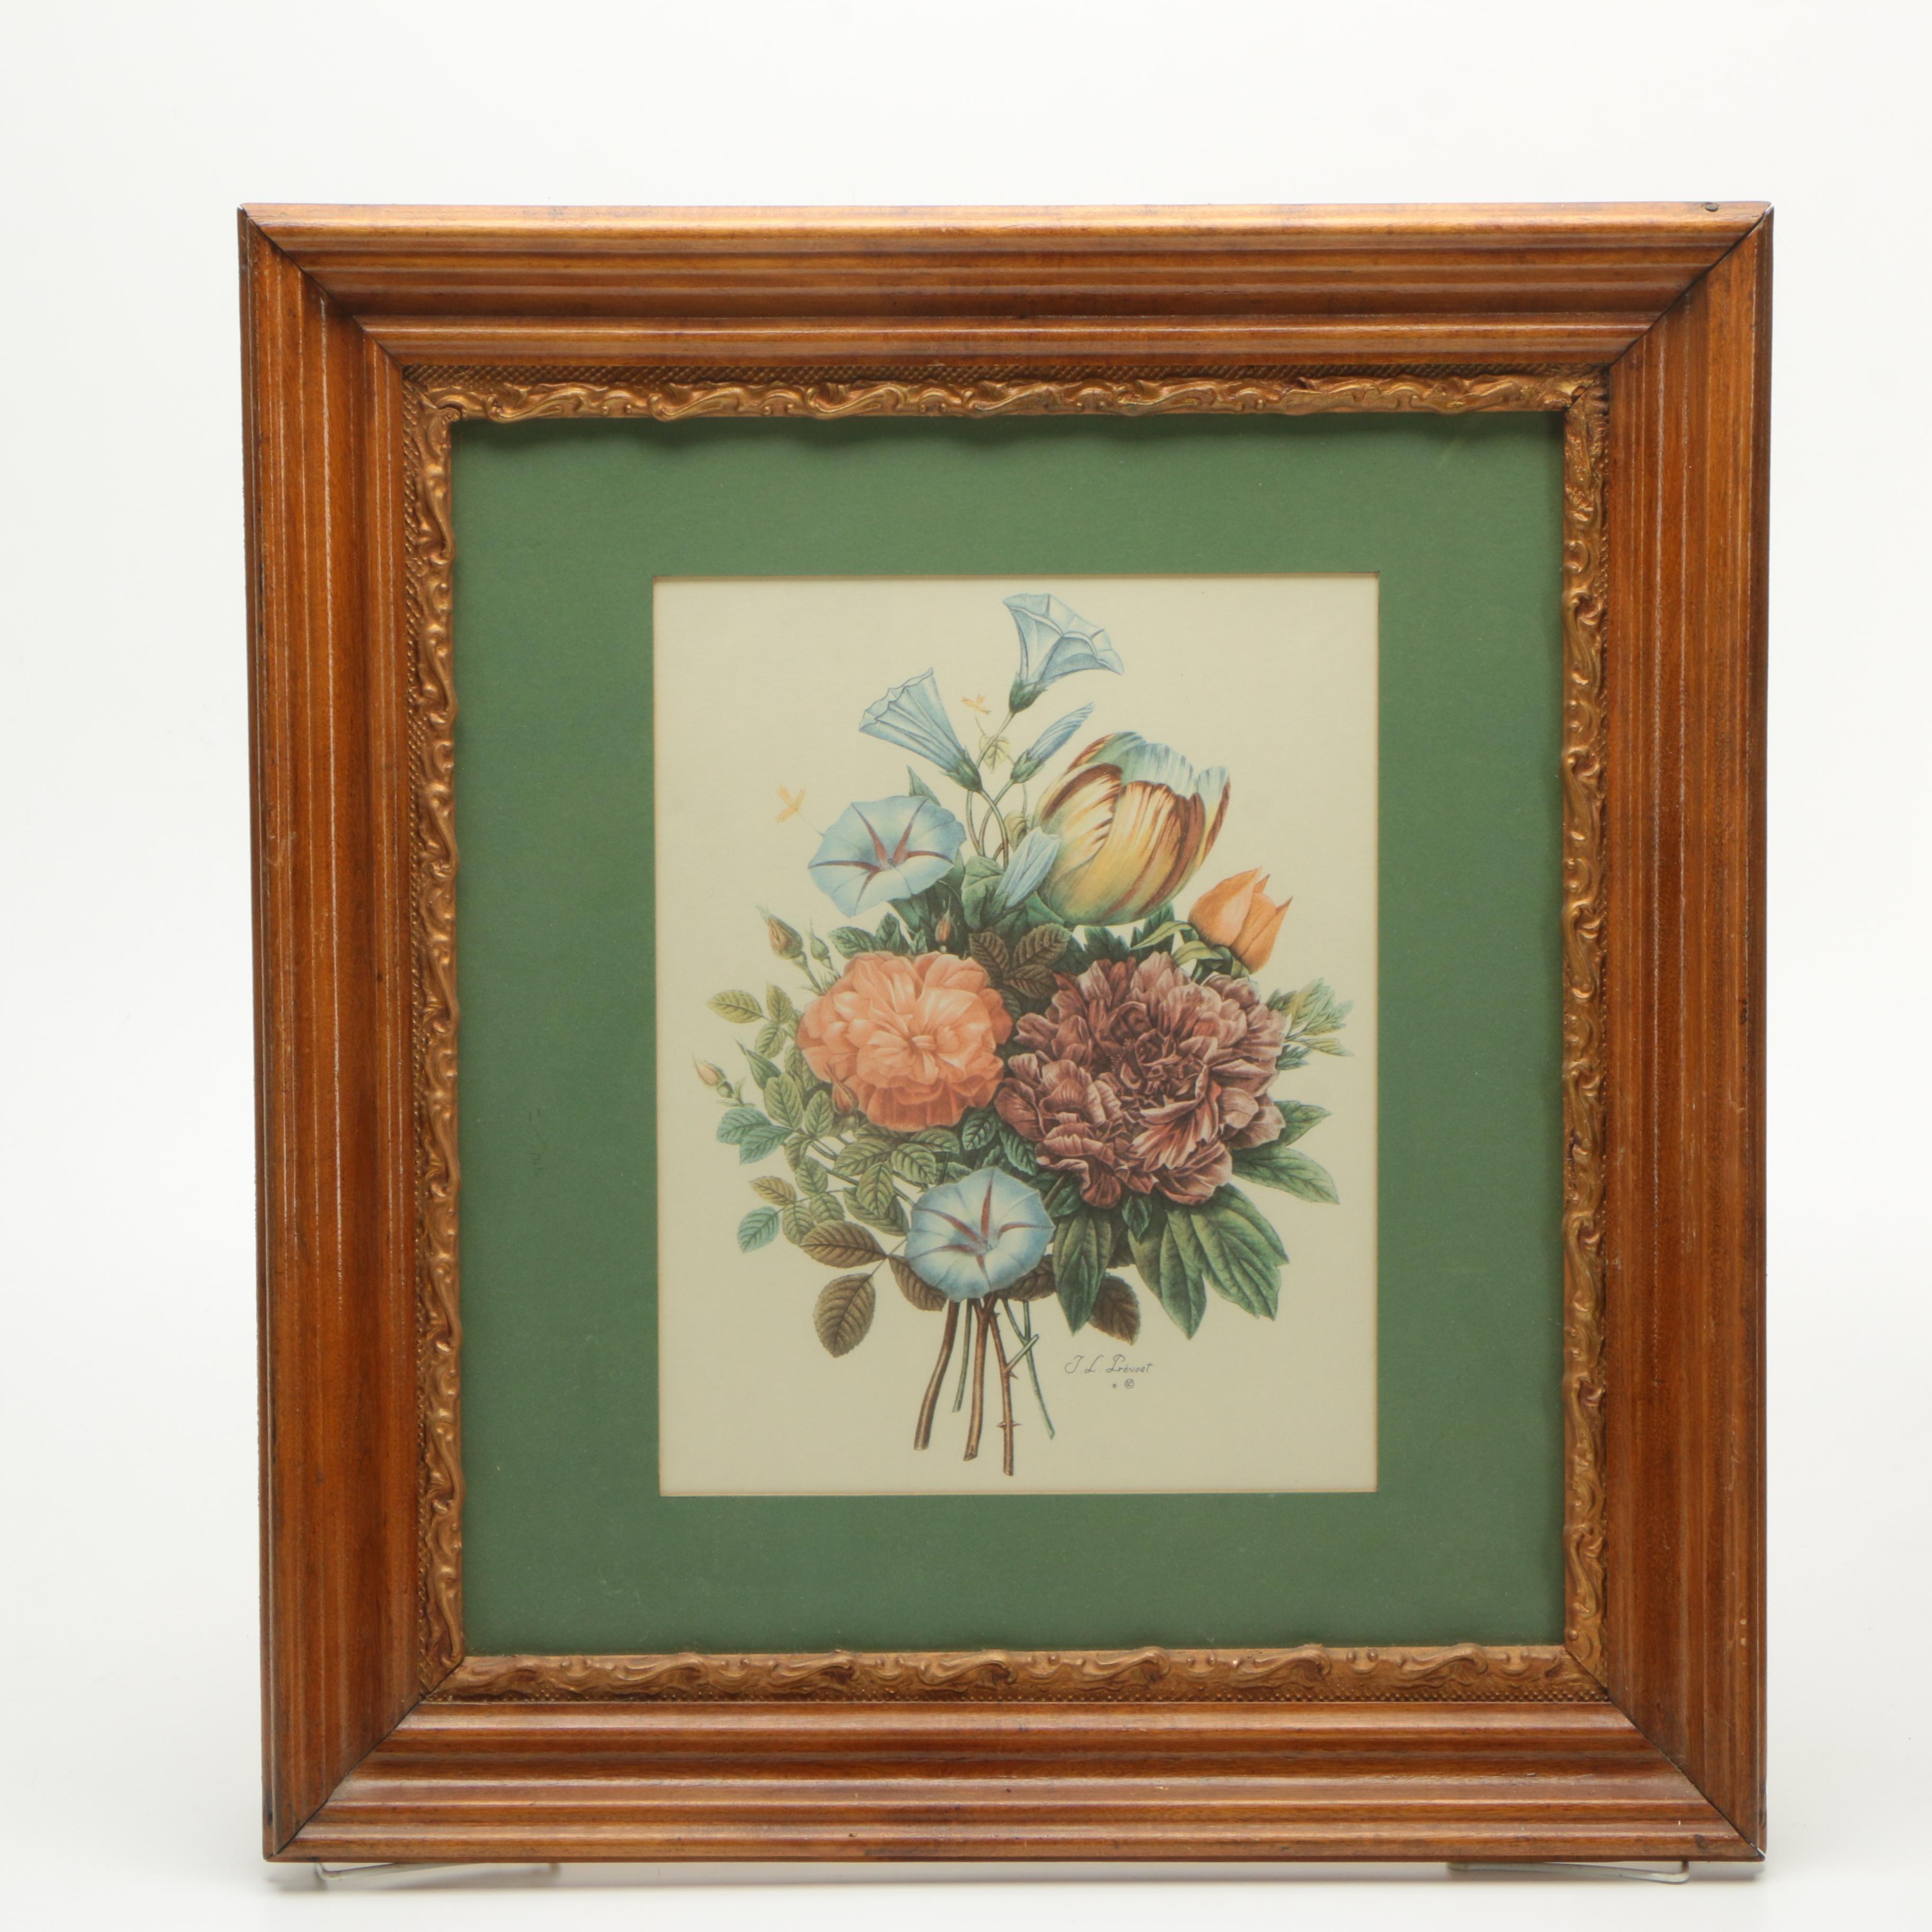 Offset Lithograph After Jean Louis Prevost of a Bouquet